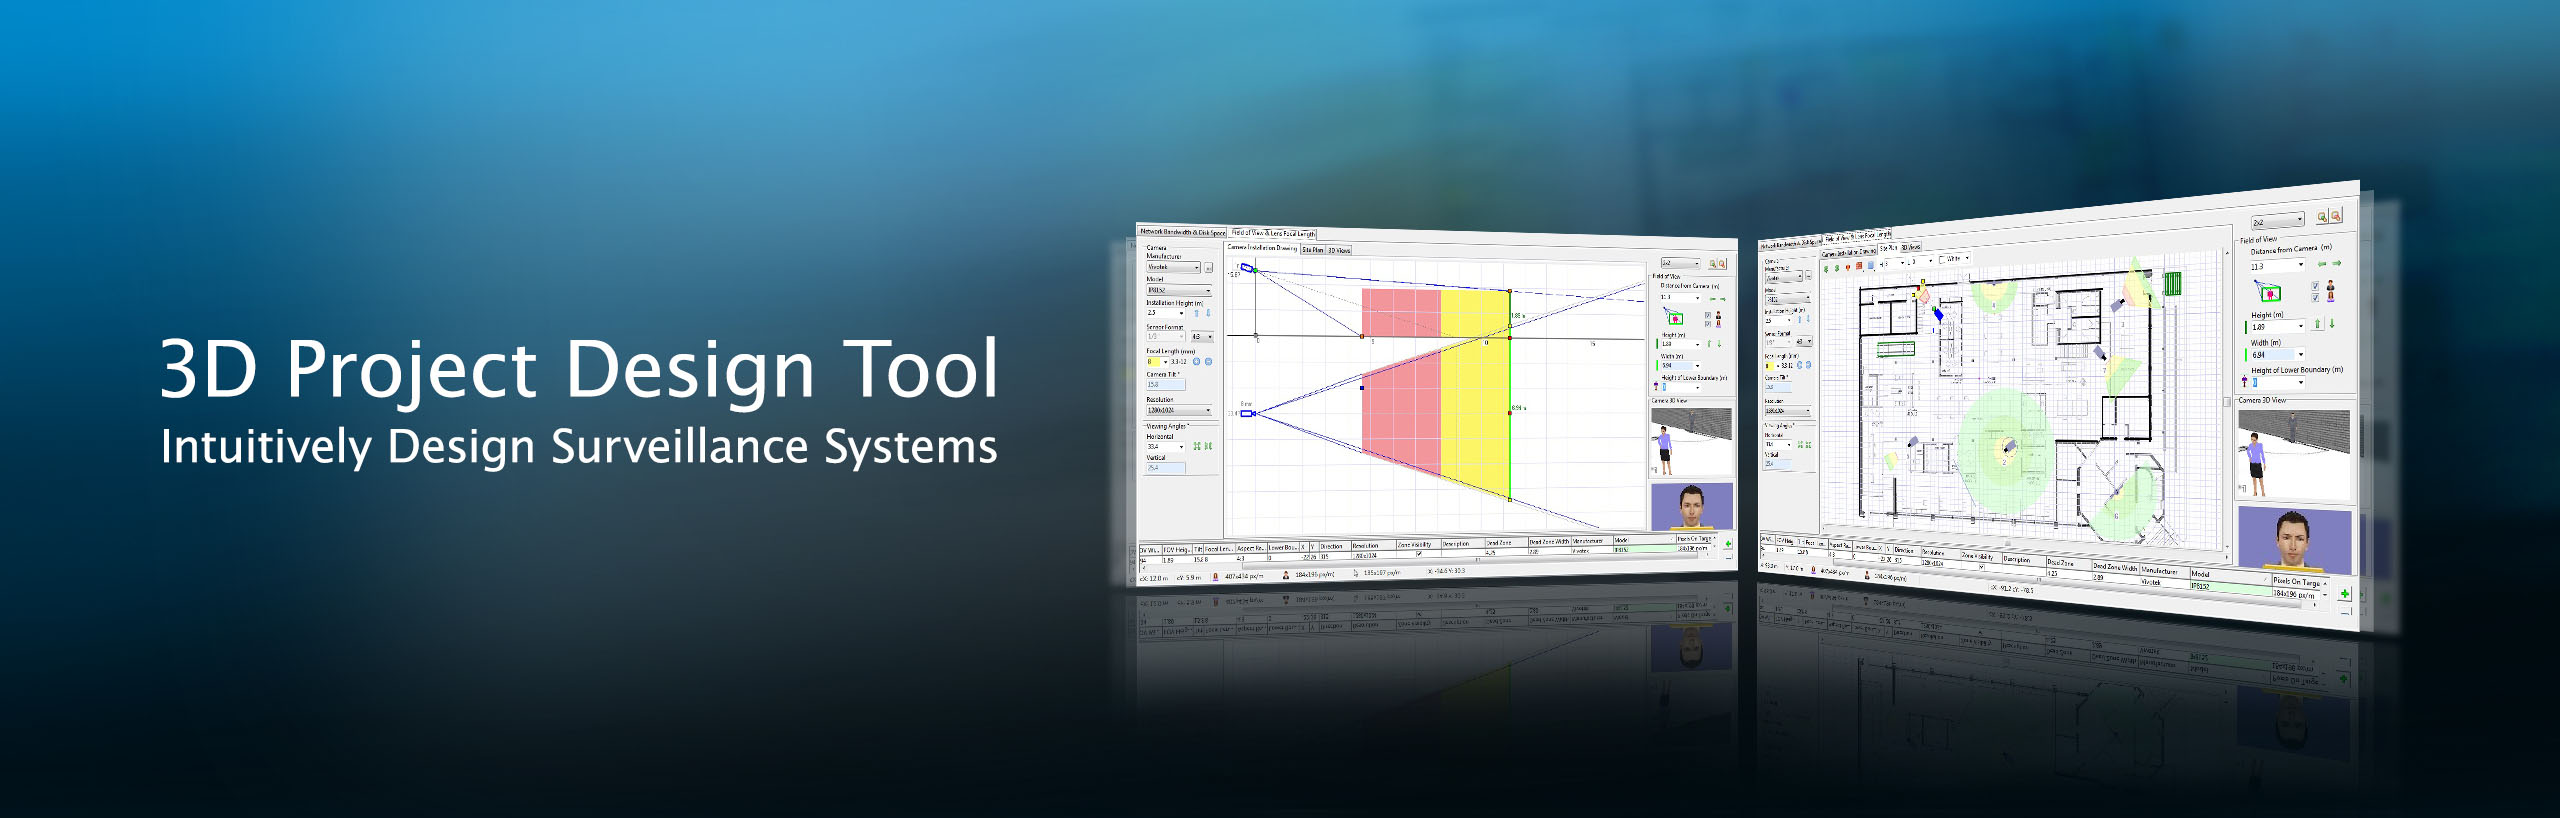 VIVOTEK Introduces 3D Project Design Tool for Surveillance System Designers